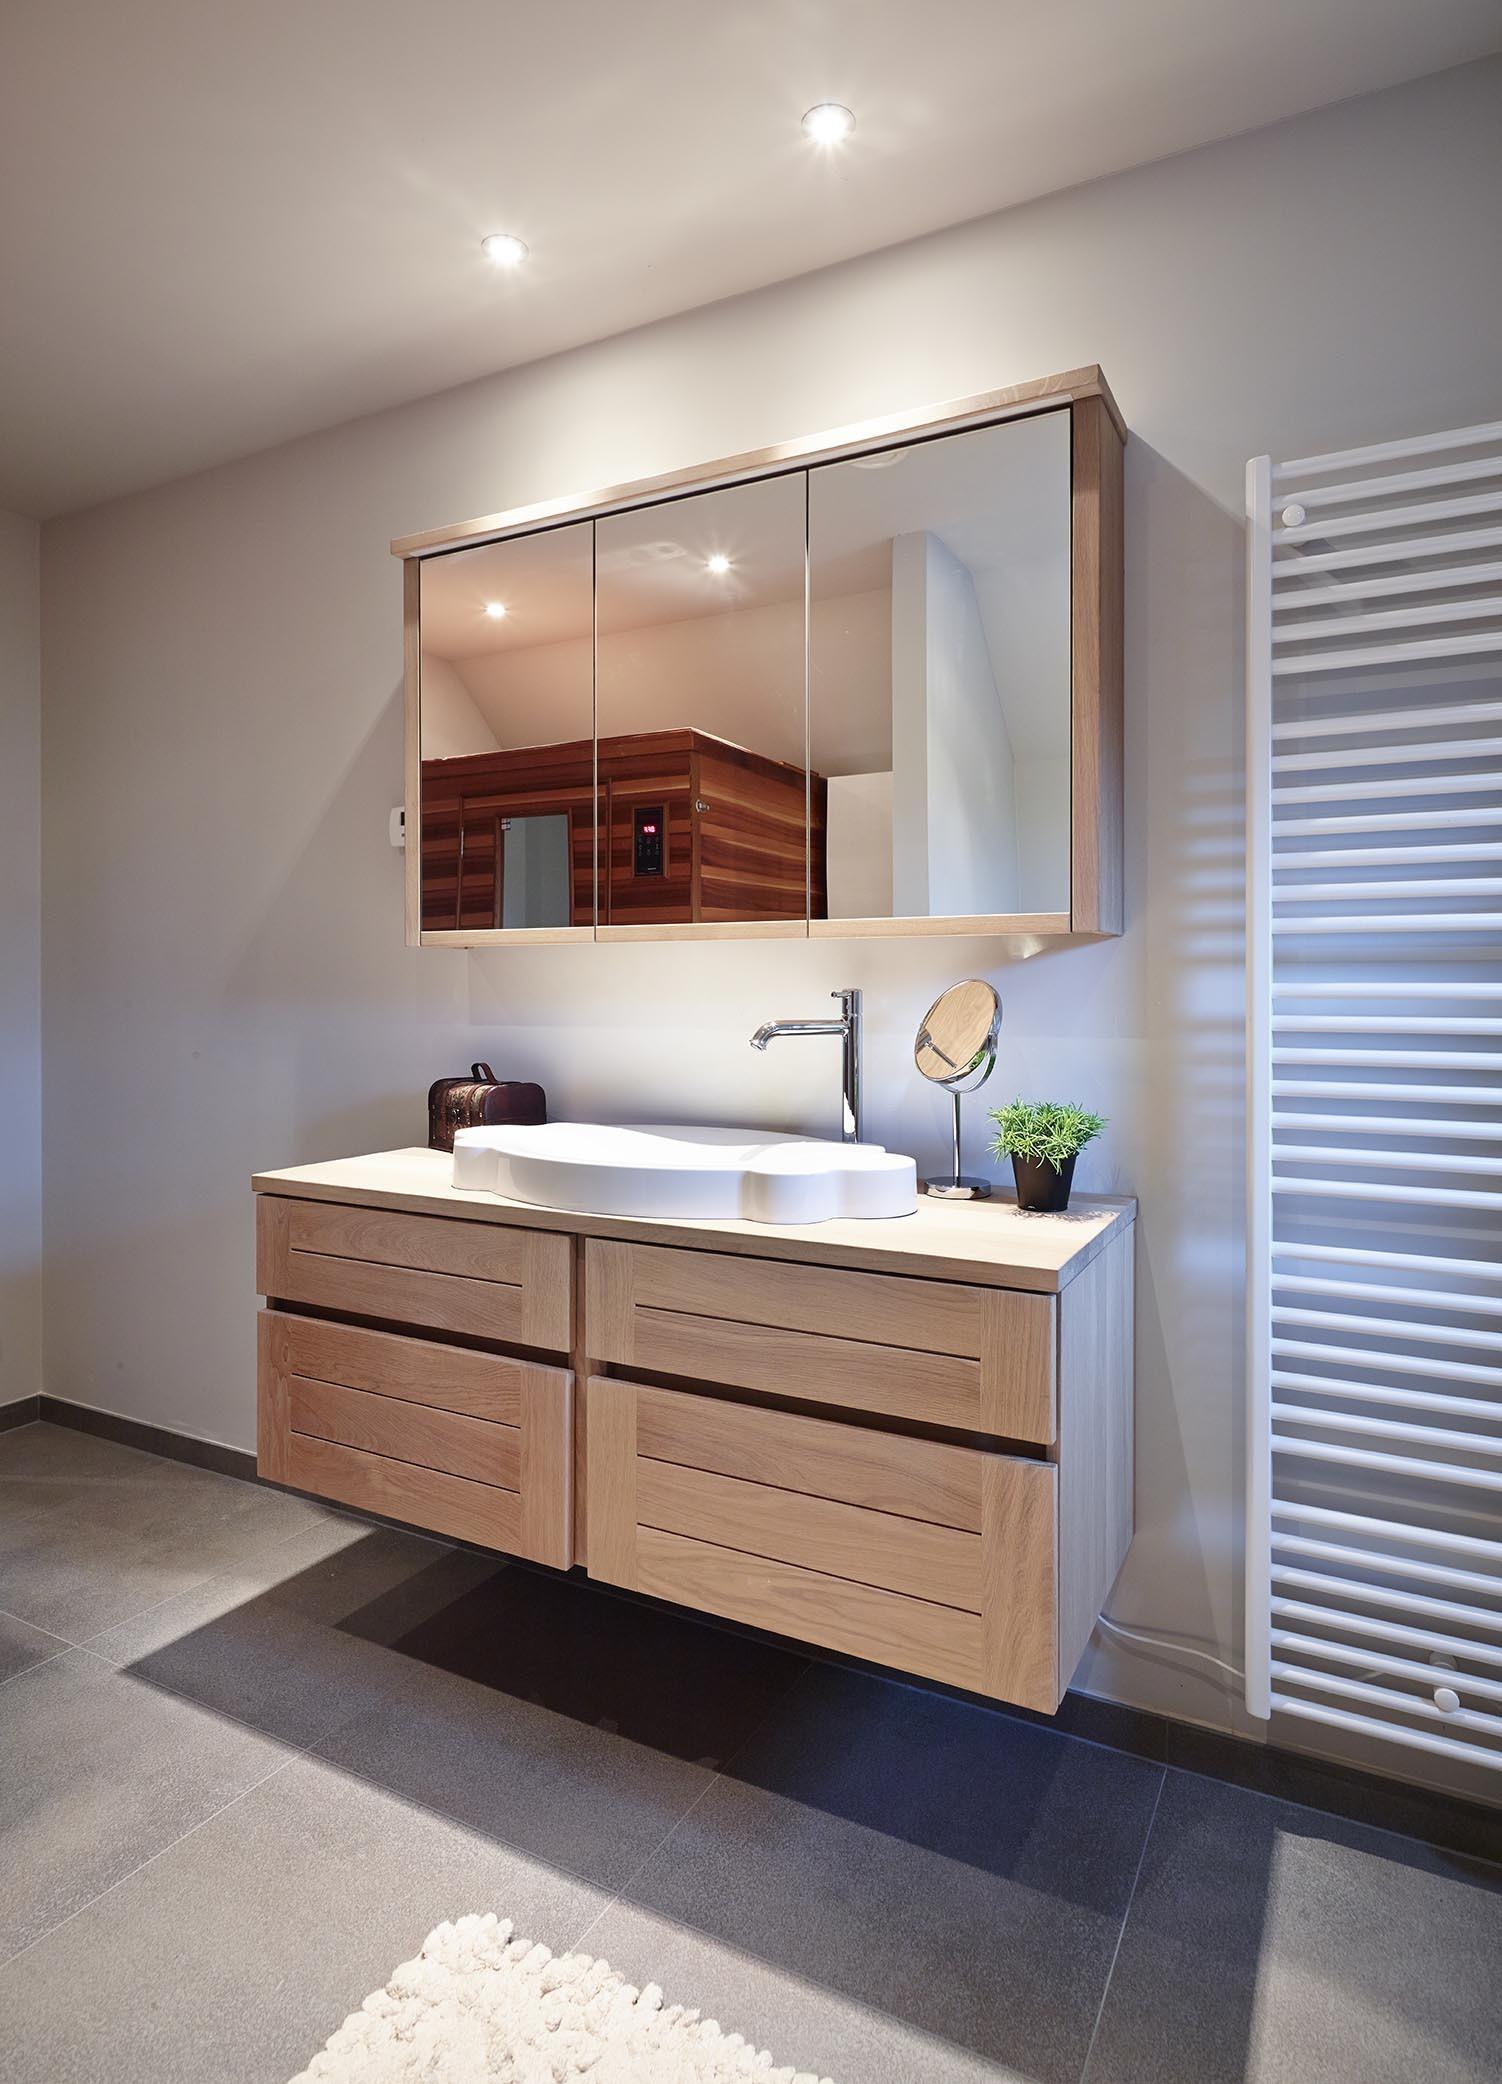 Houten badkamer met grote spiegel en wasbak